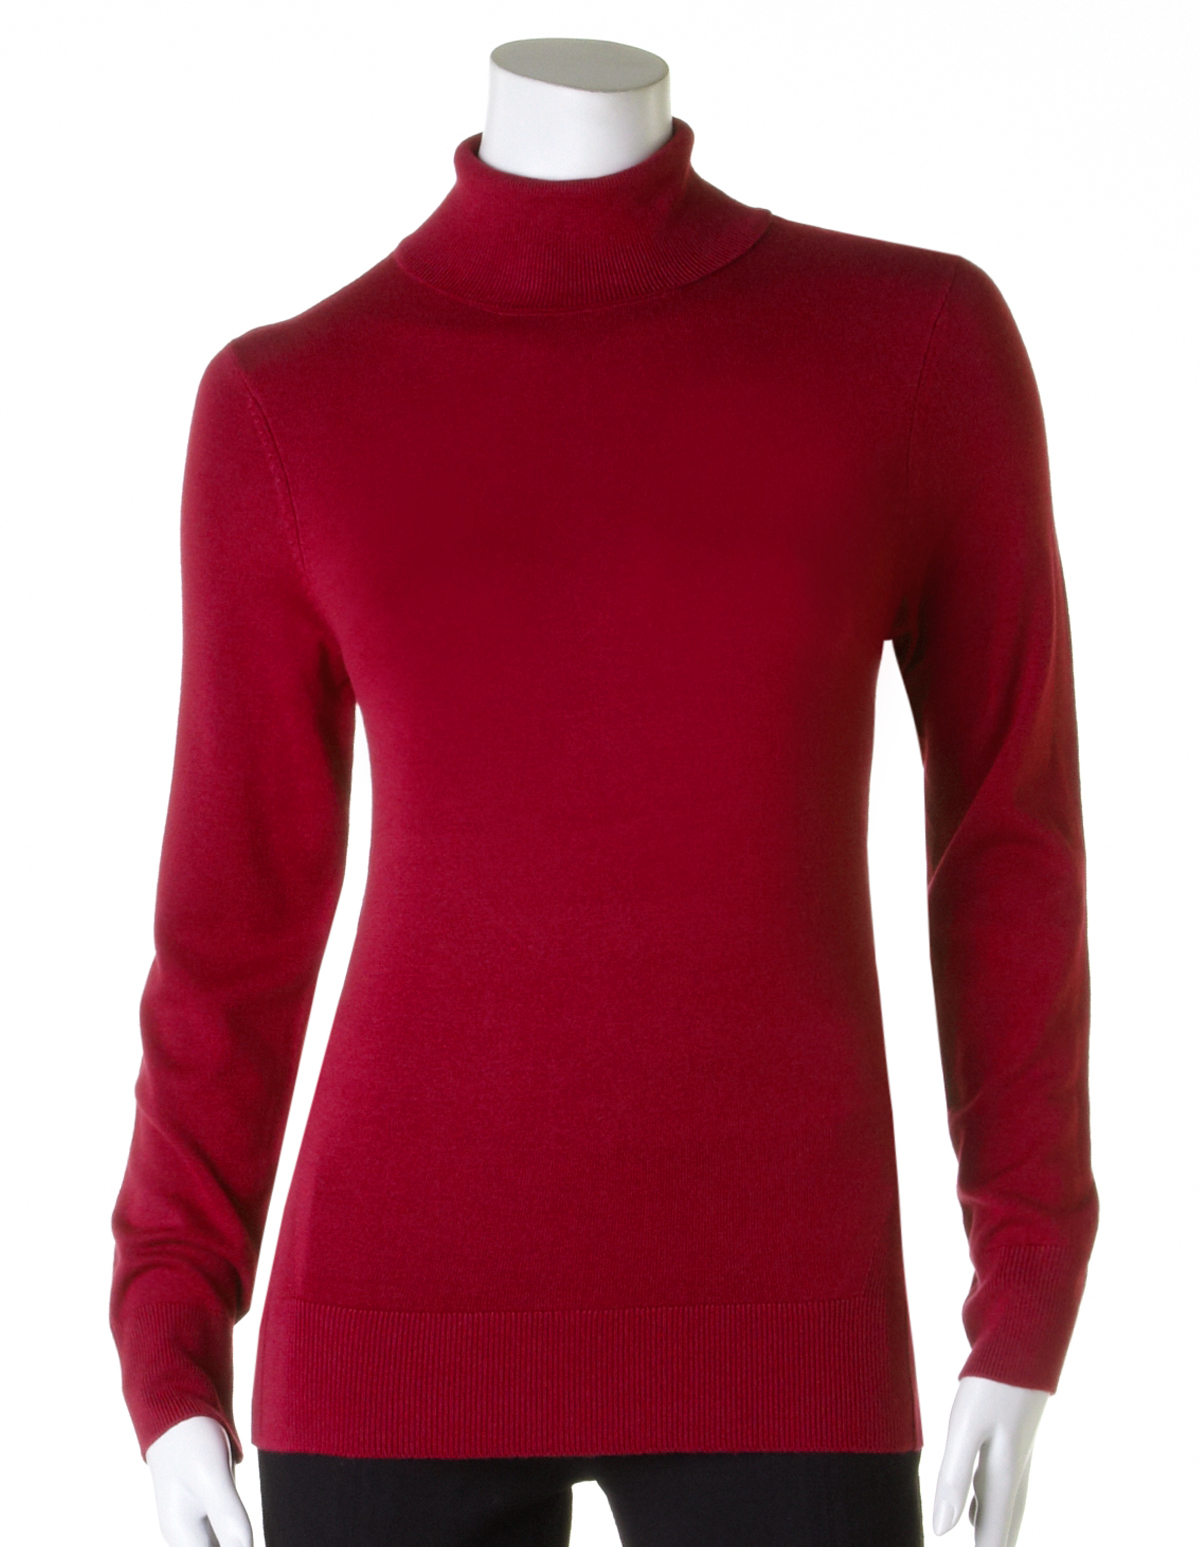 afac56bbdbaa Essential Turtleneck Sweater